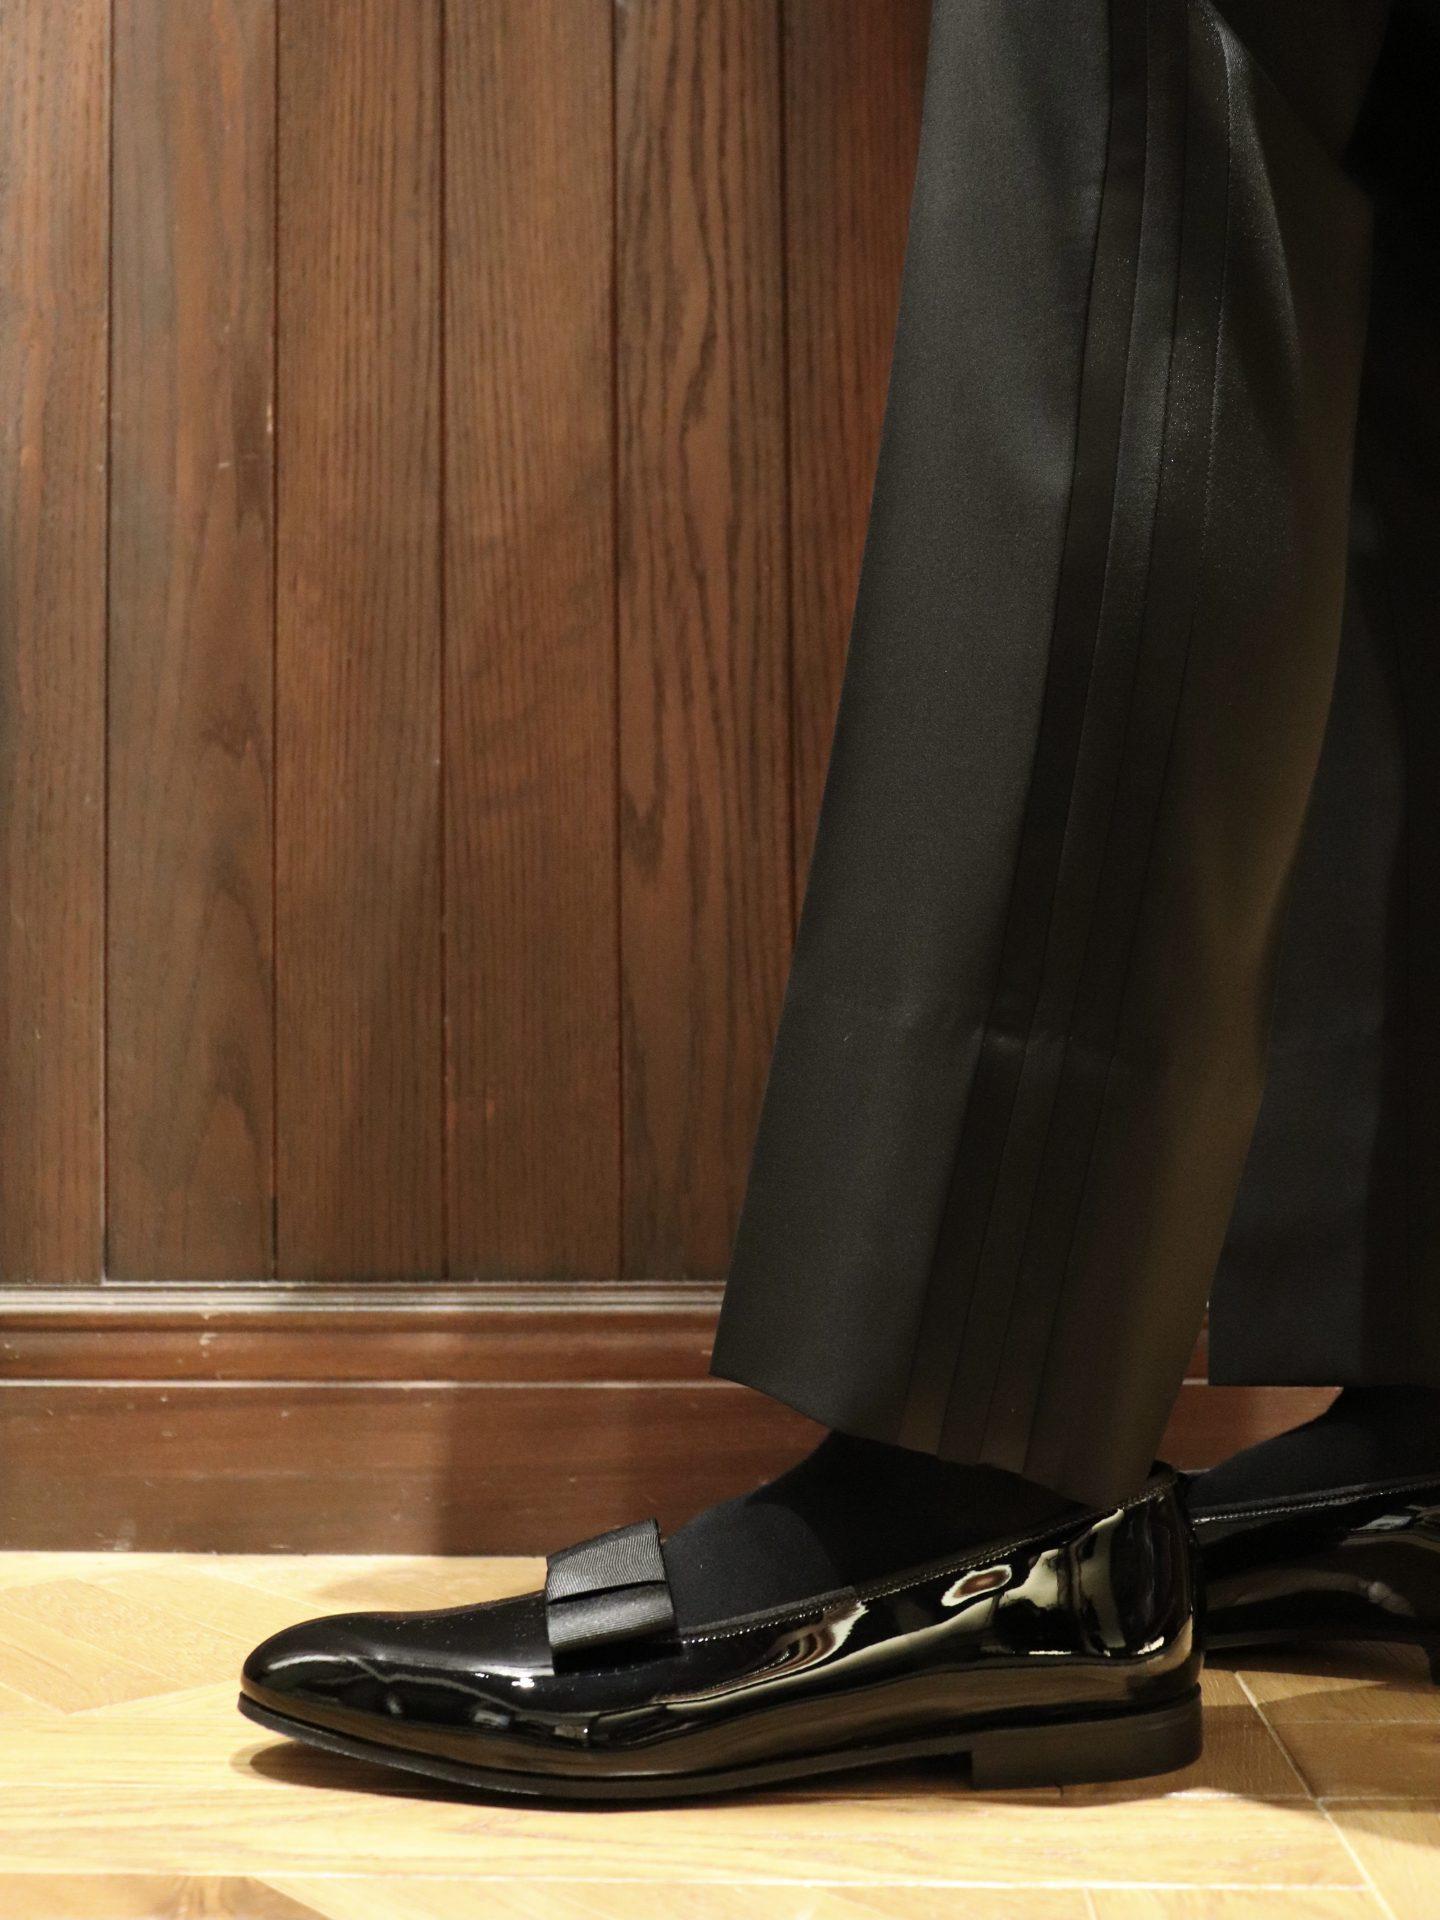 ・THE TREAT DRESSING名古屋店で紹介するTHE CONDER HOUSEでおすすめのフォーマルスタイルの燕尾服